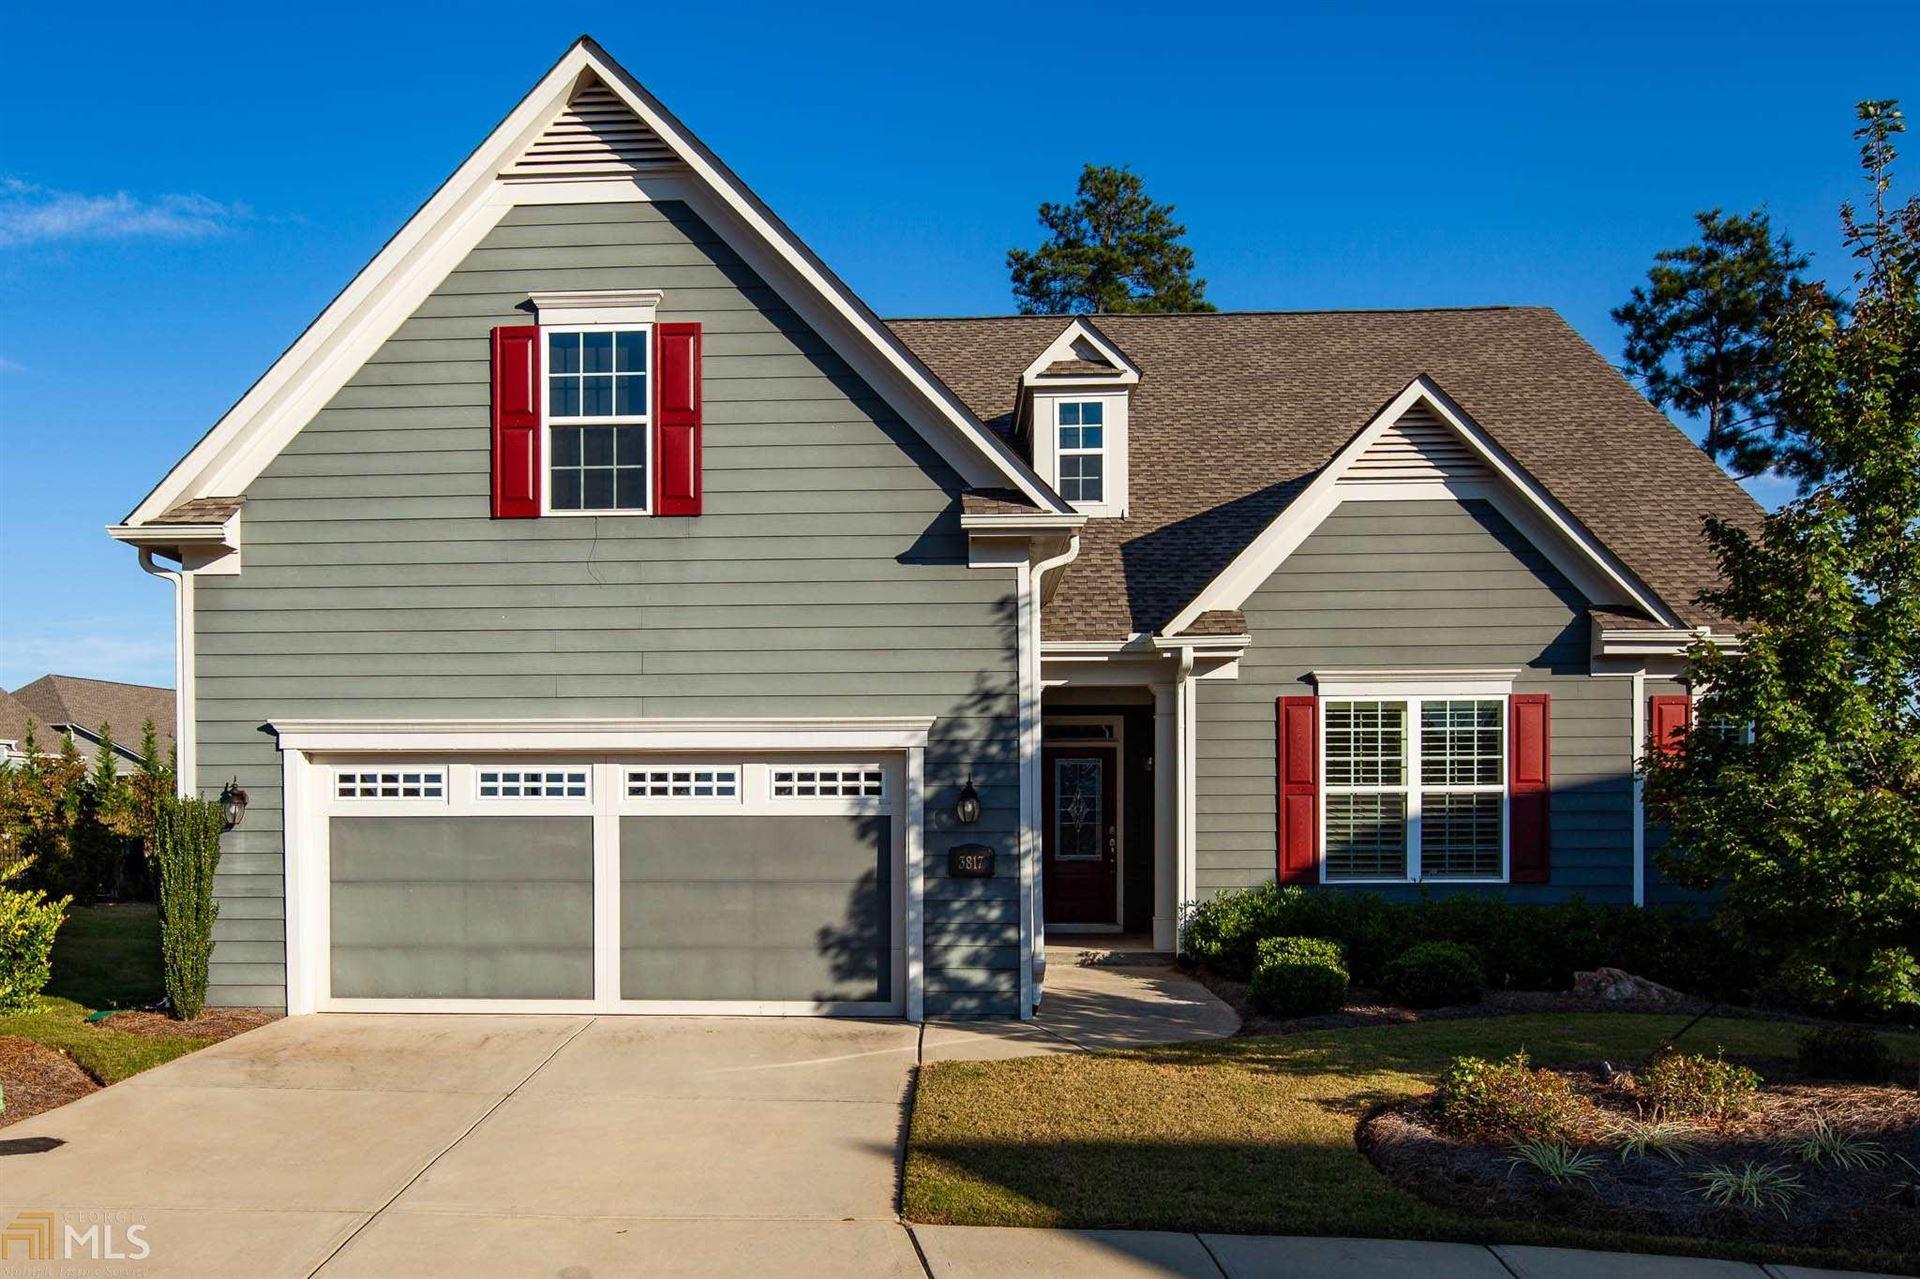 3817 Boxwood Ct, Gainesville, GA 30504 - MLS#: 8872072